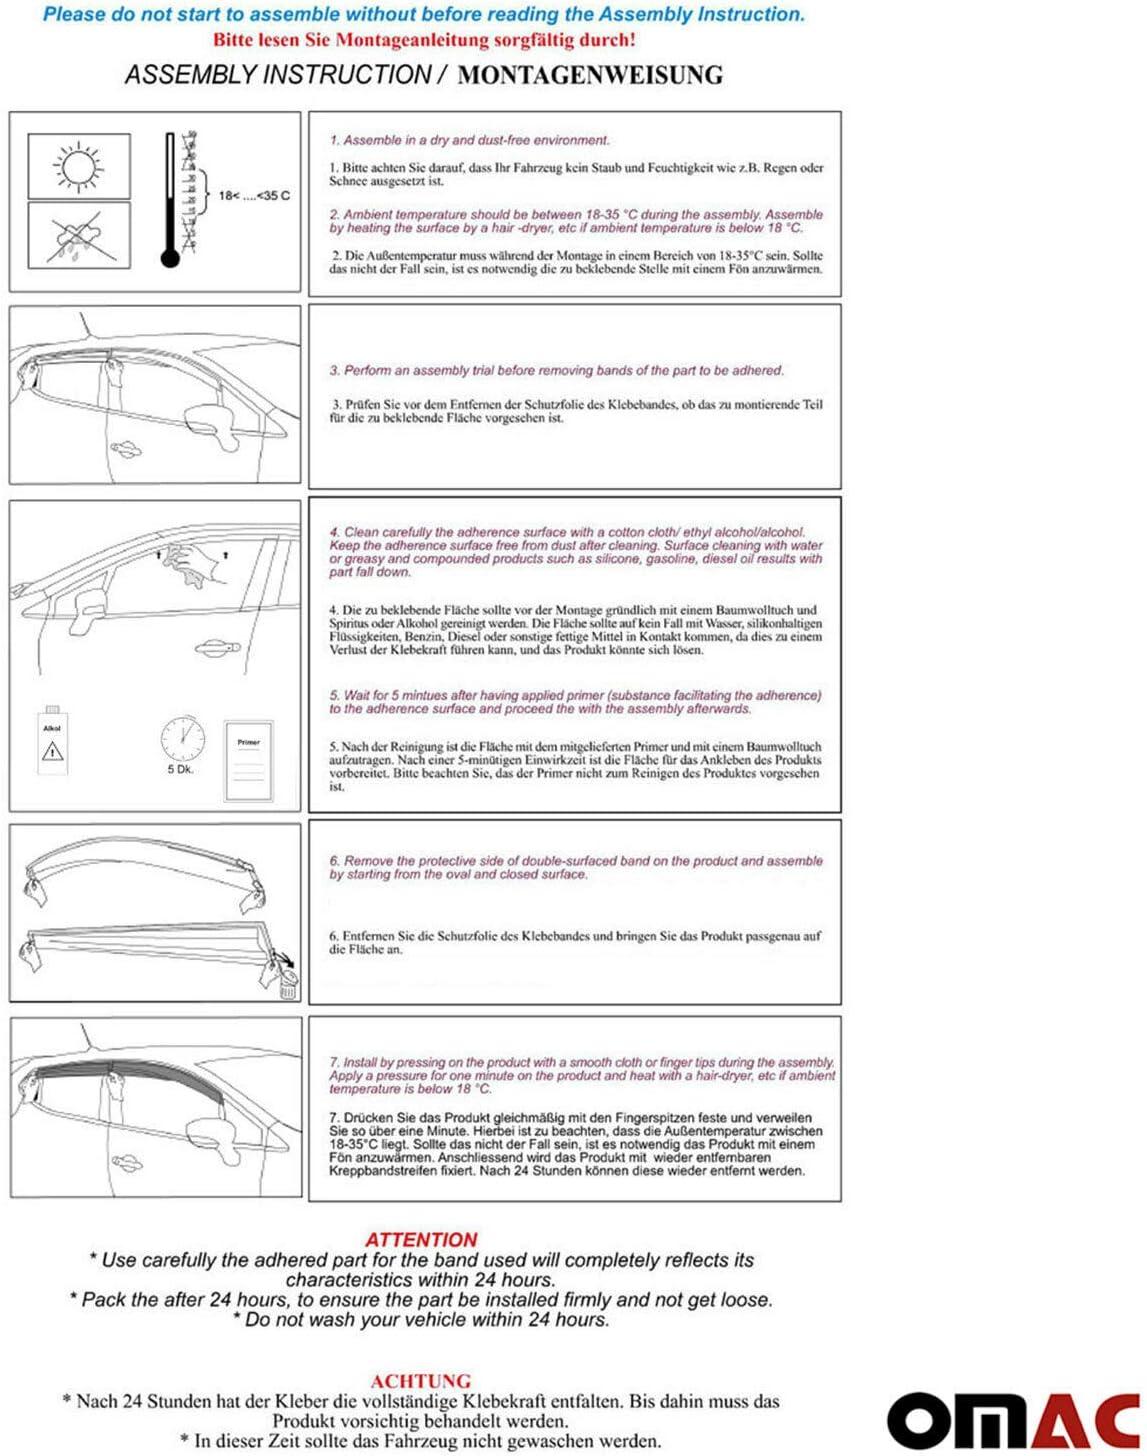 2 pcs Fits Ford Transit 2014-2020 OMAC Front Side Door Window Ventvisor Black Smoke Air Rain Wind Deflector Guards